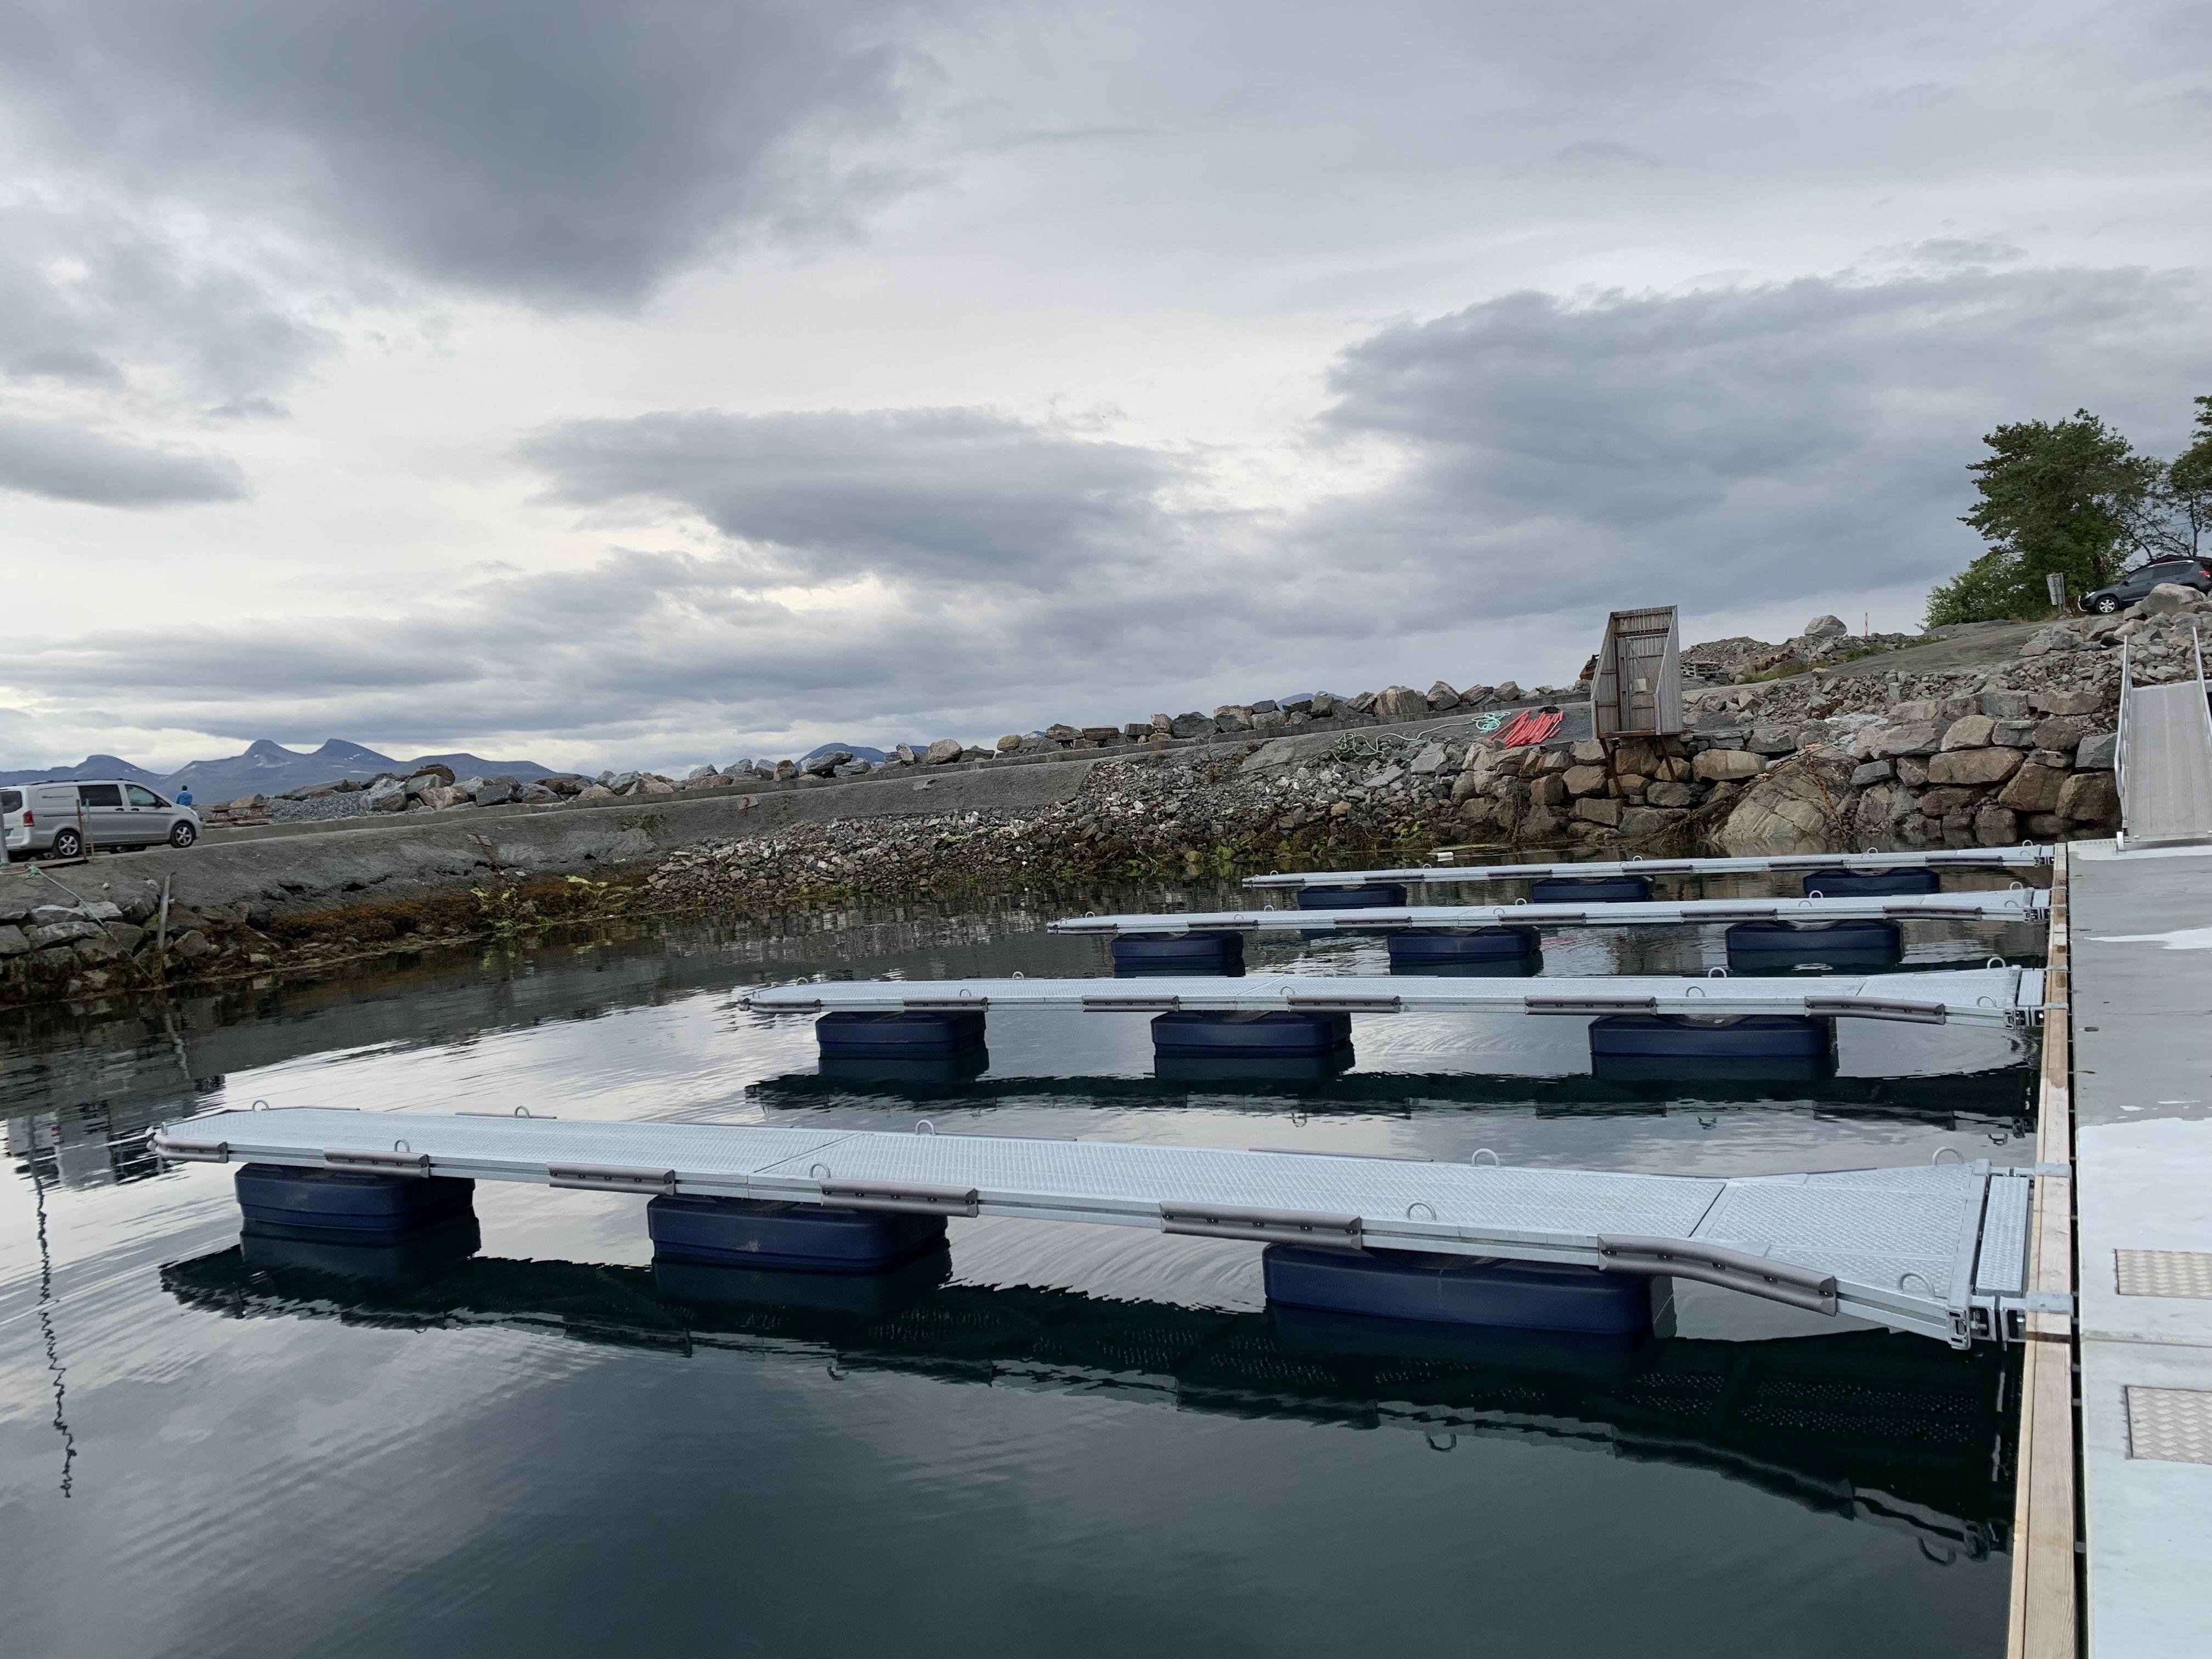 https://www.marinasolutions.no/uploads/Cap-Clara-Småbåtshavn-oppgradering-bryggepir-betongbrygge_-heavy-duty-utriggere.jpg